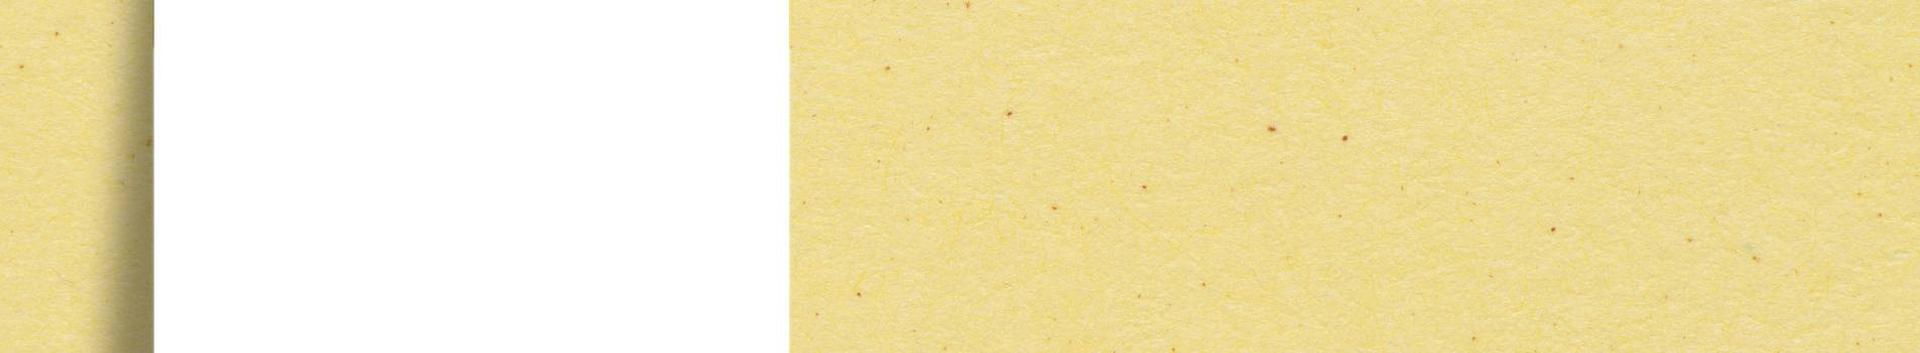 23691_muude-tsementtoodete-tootmine_23098085_xl.jpg